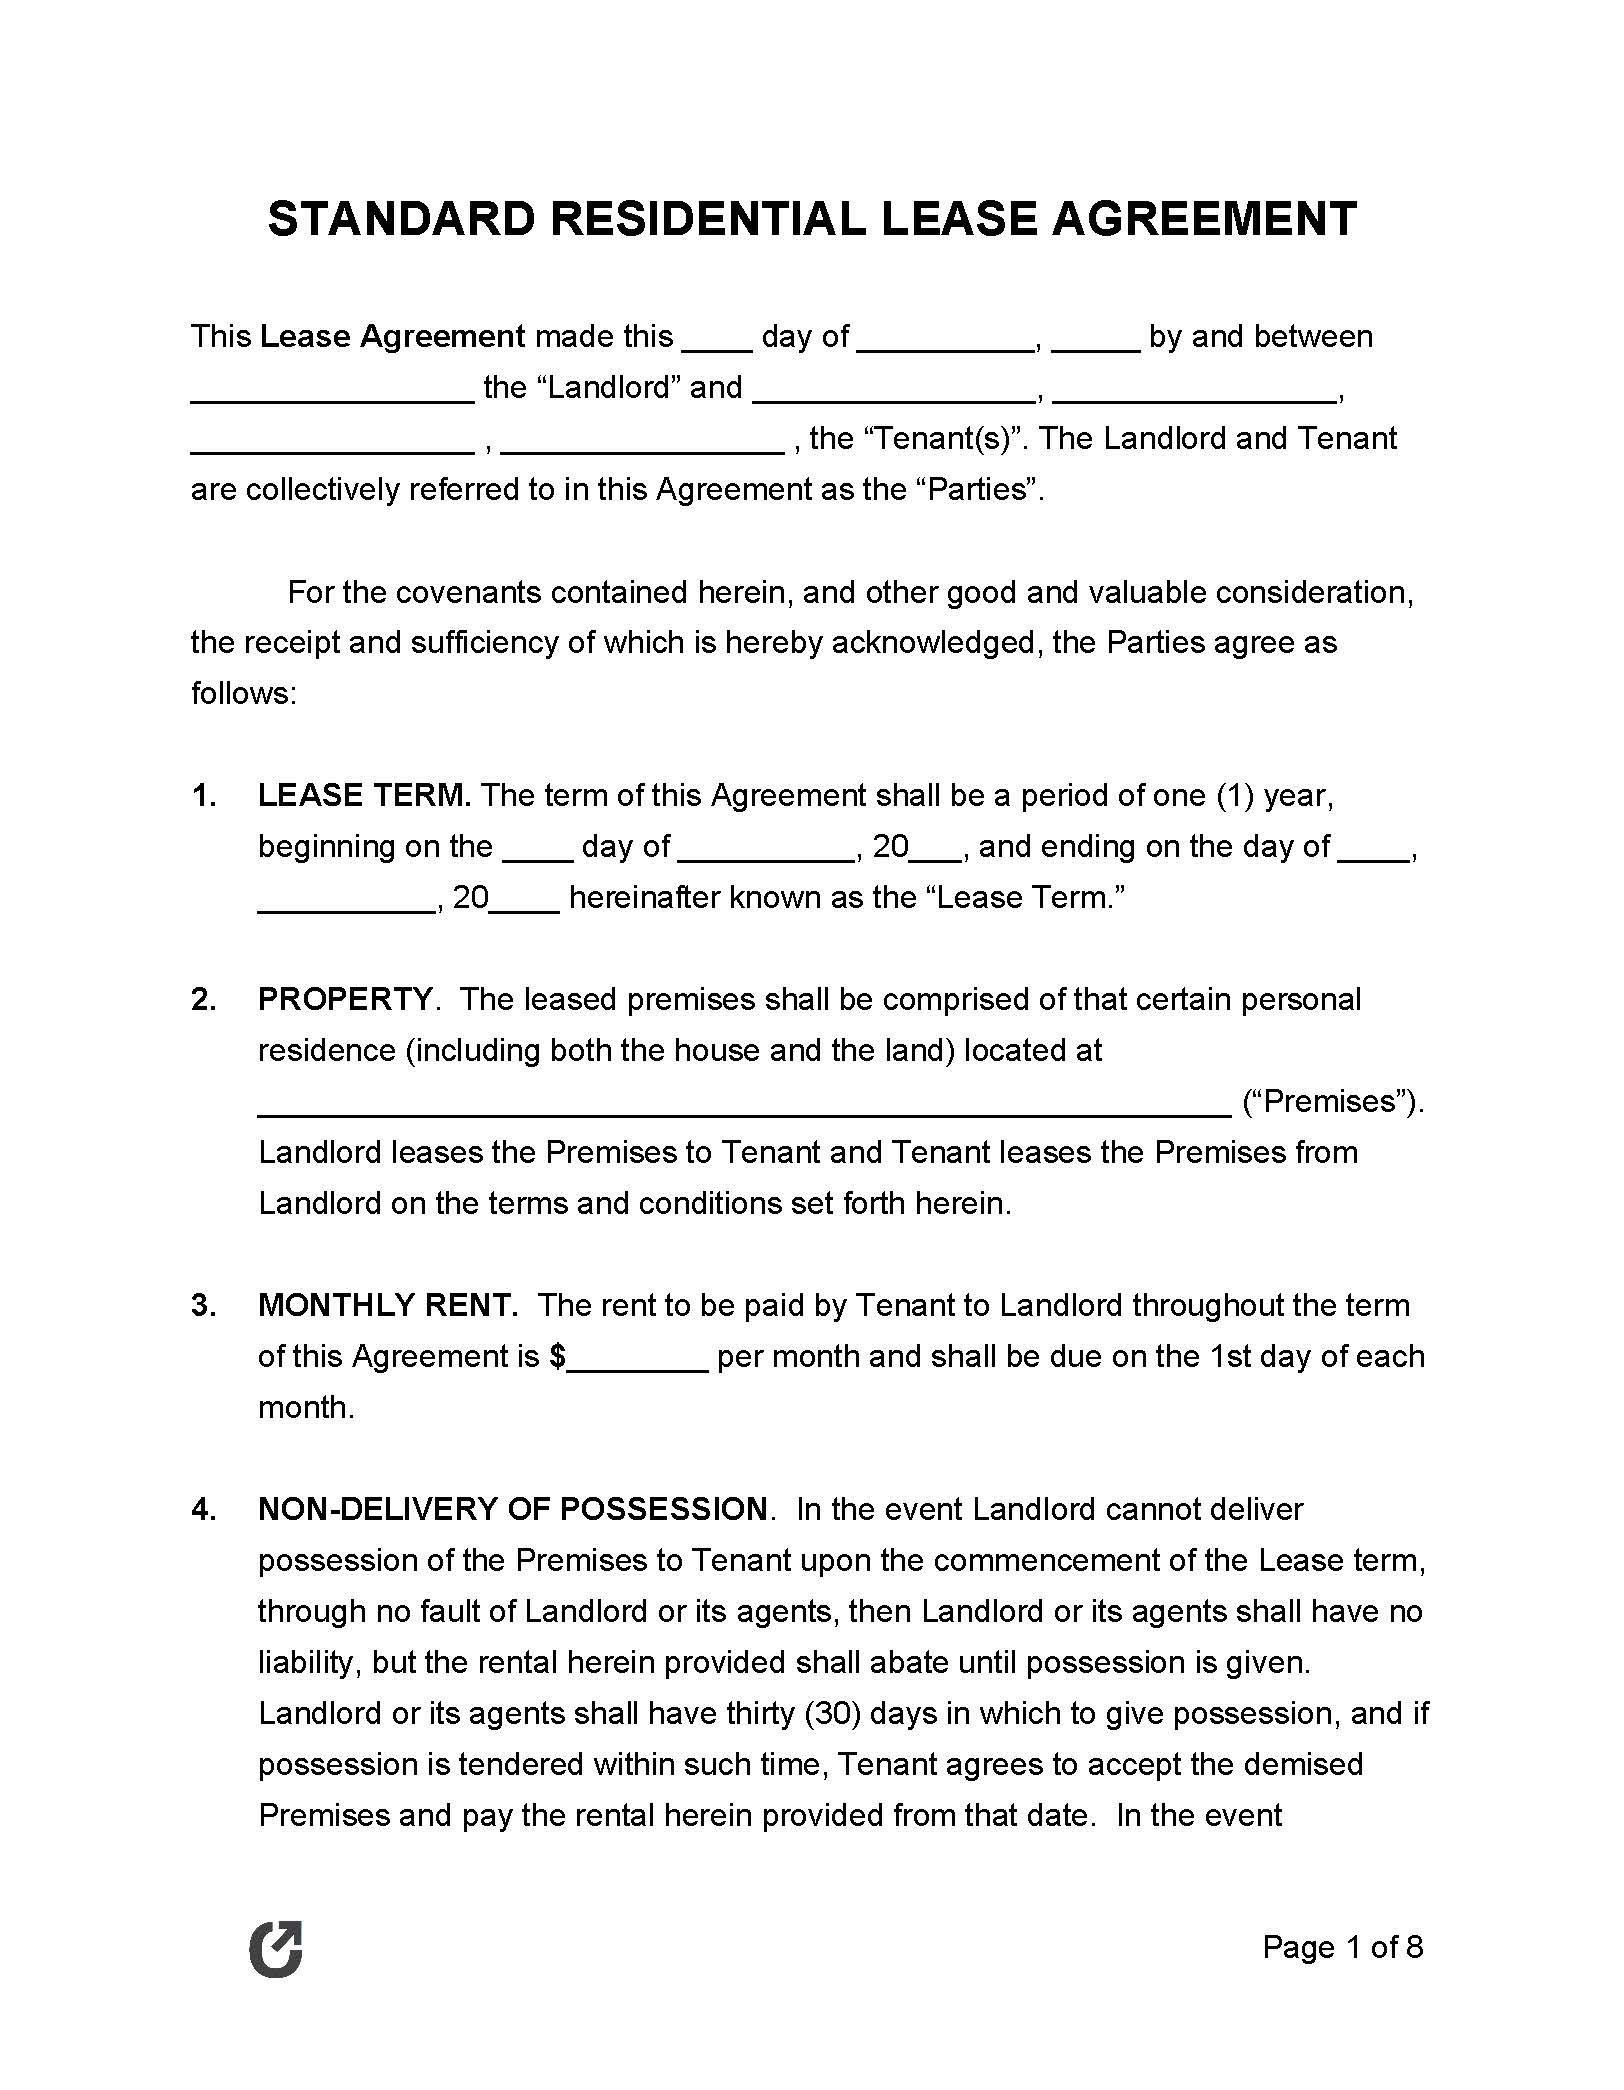 008 Surprising Residential Lease Agreement Template Photo  Tenancy Form Alberta CaliforniaFull